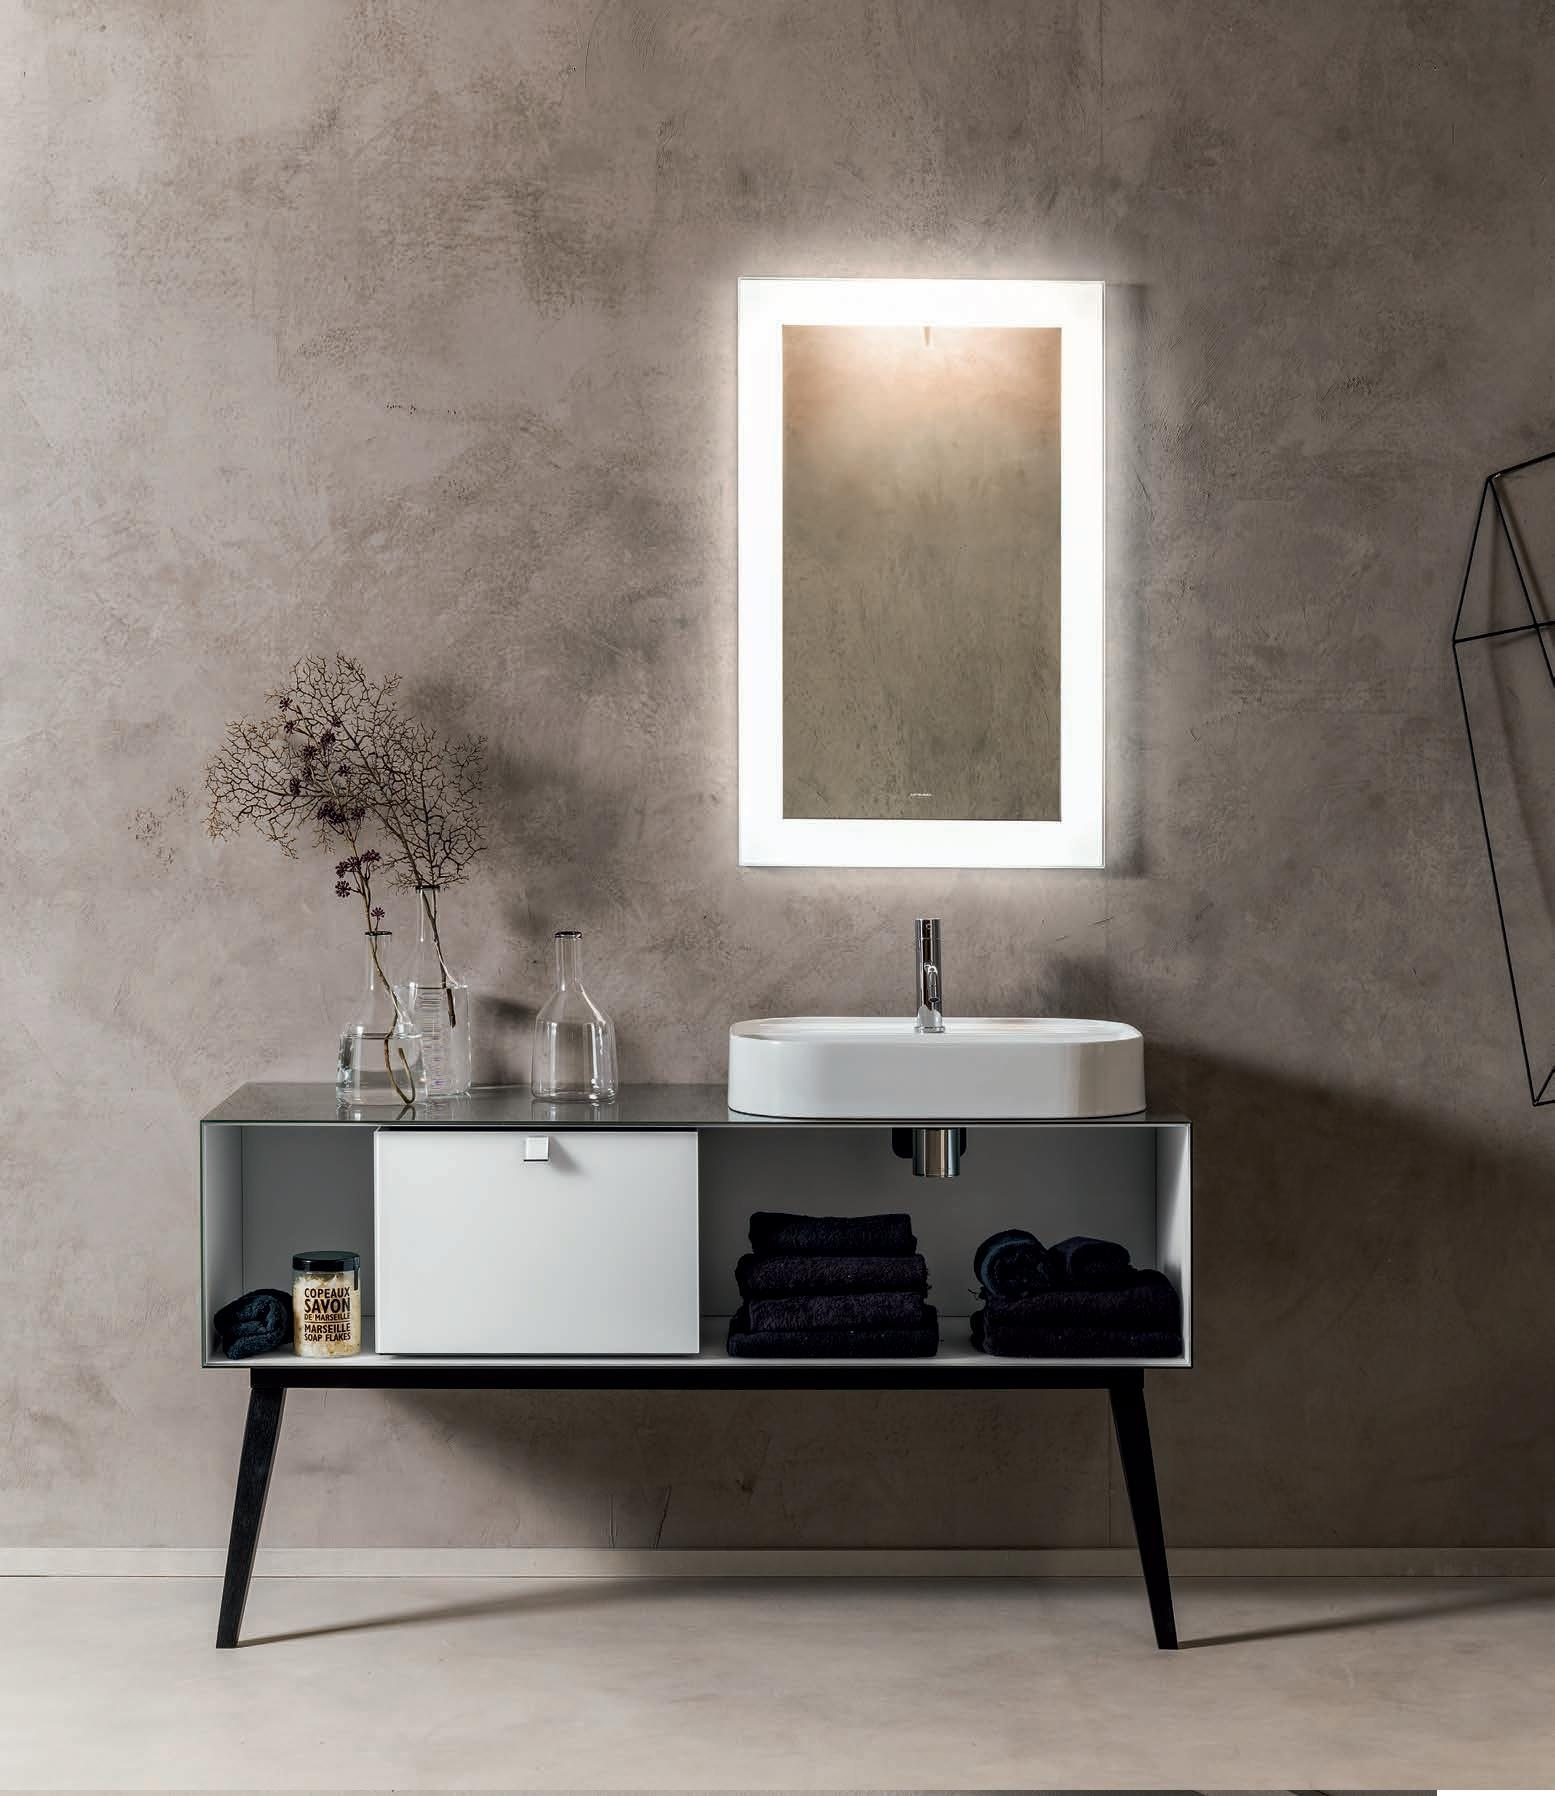 Sanitari & Arredo bagno Alto Adige - Dama mobili da bagno di vetro ...